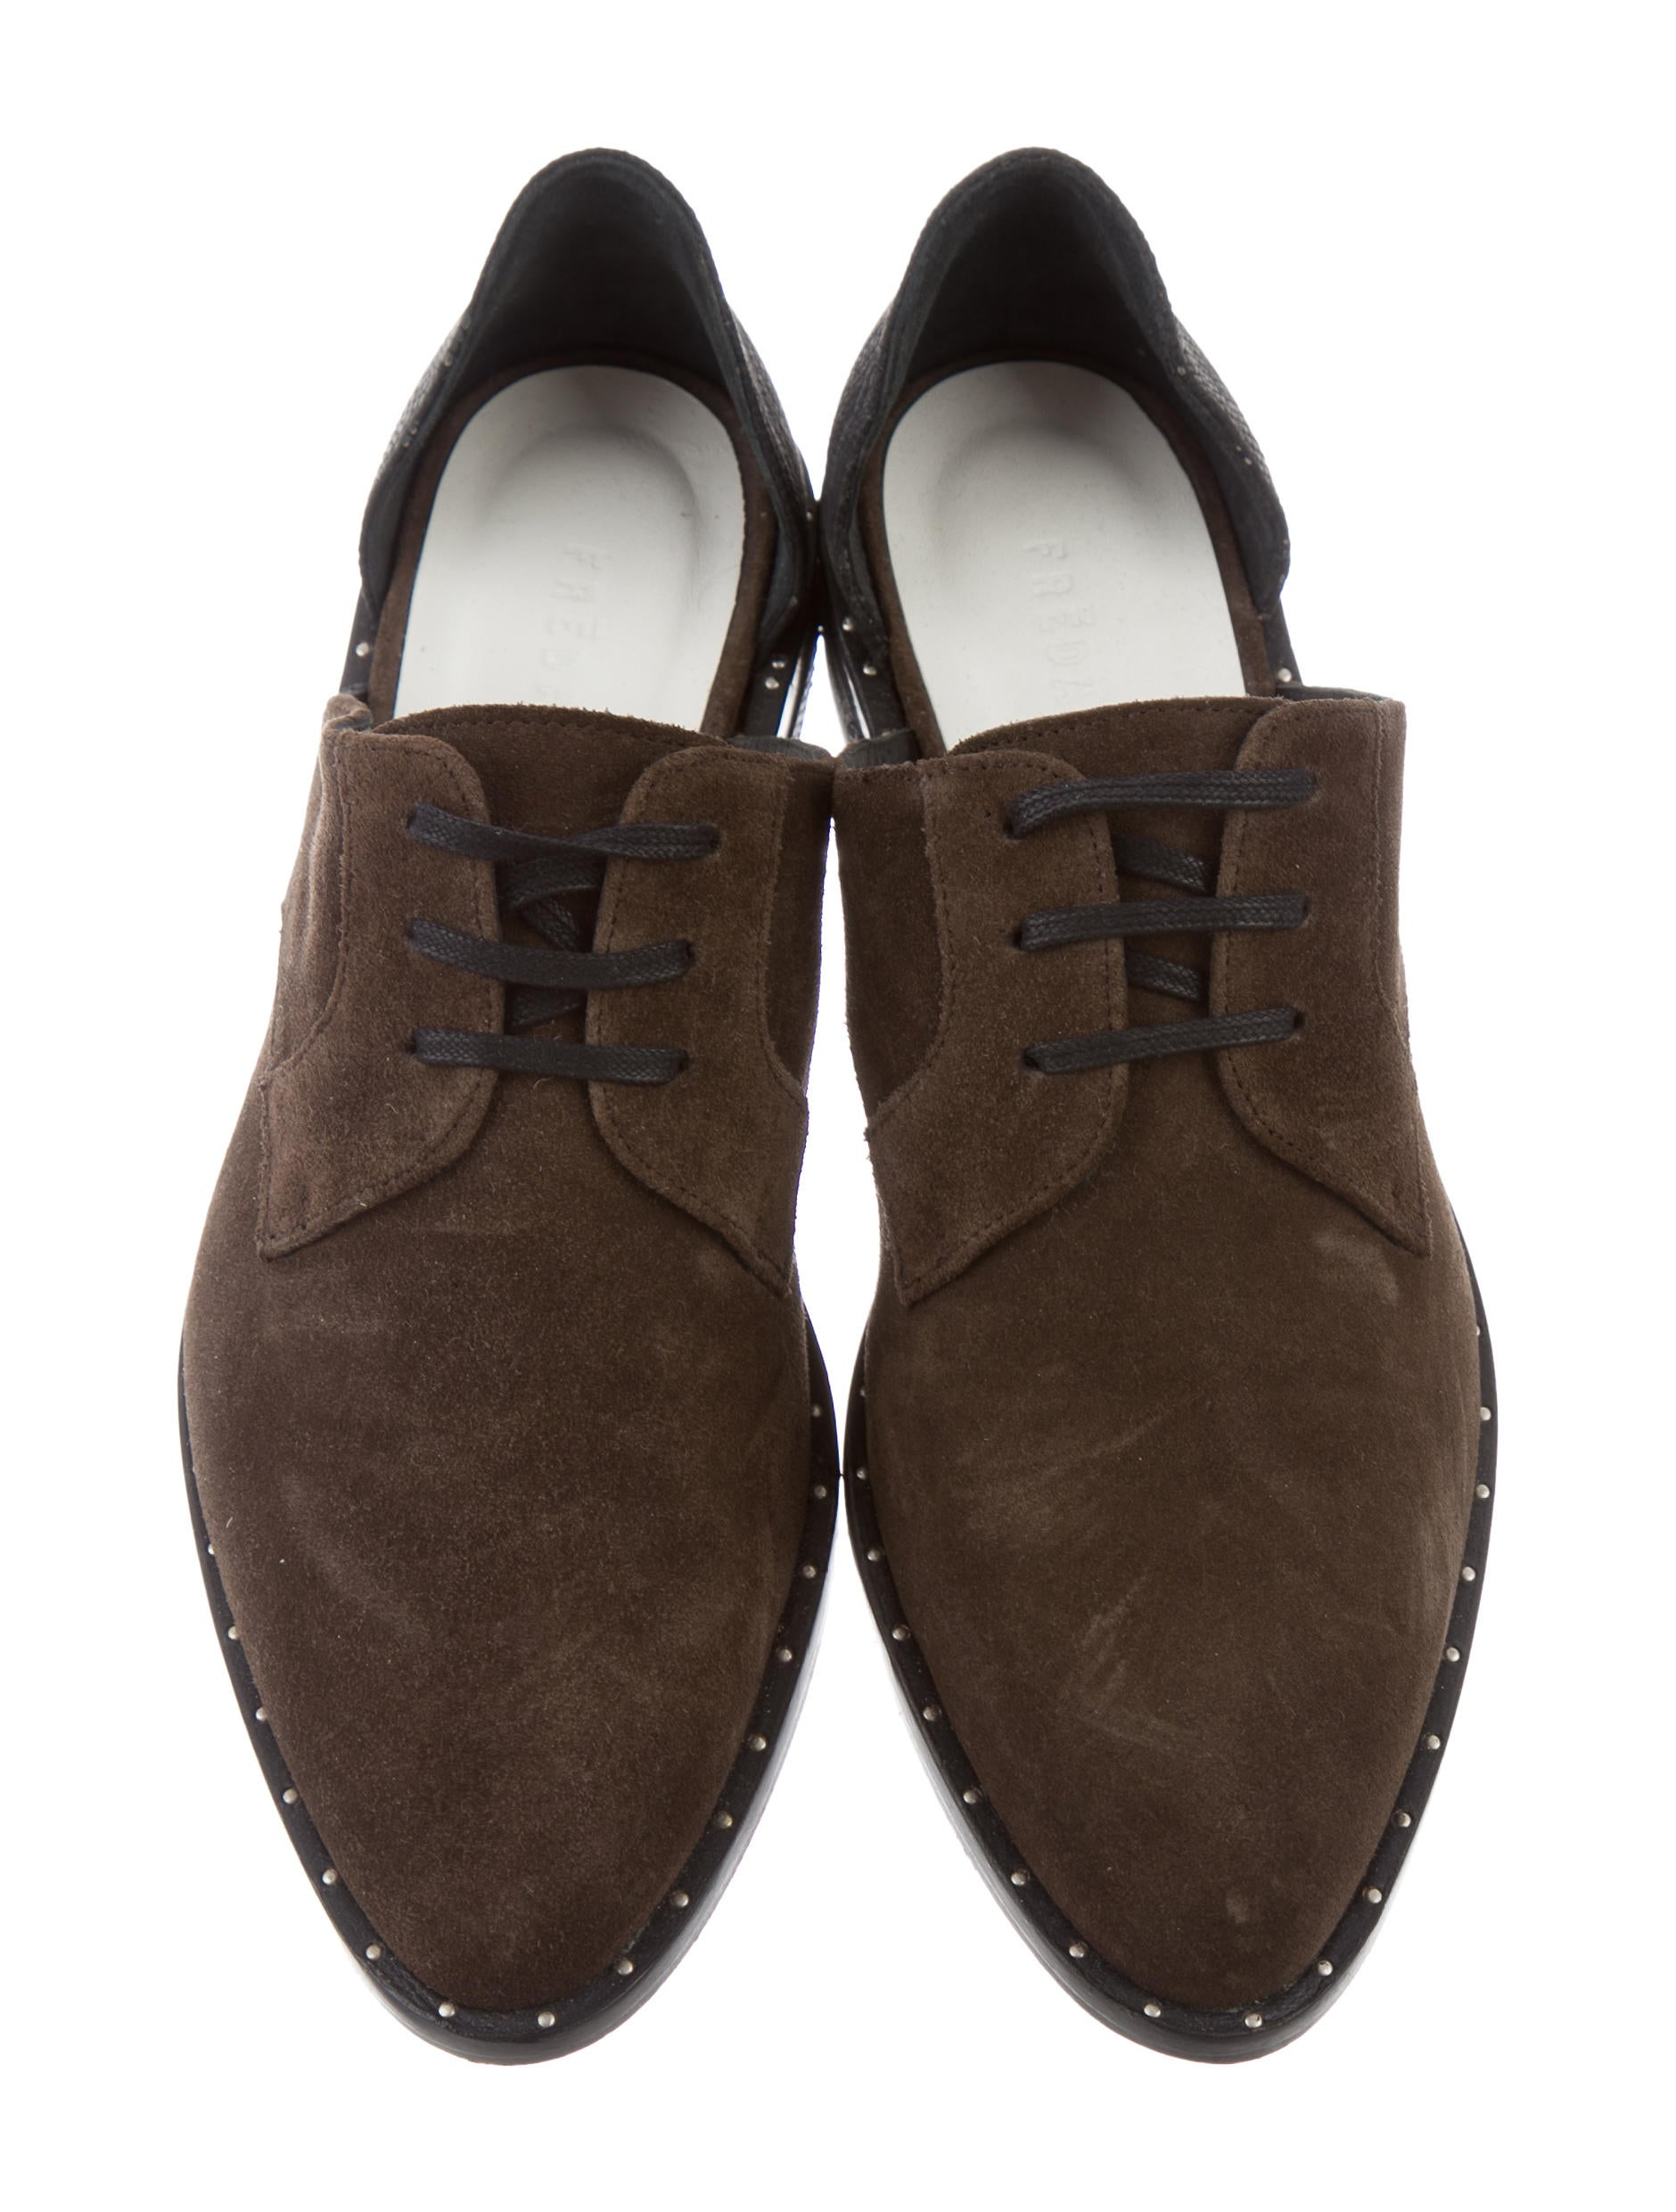 Freda Salvador Shoes Sale